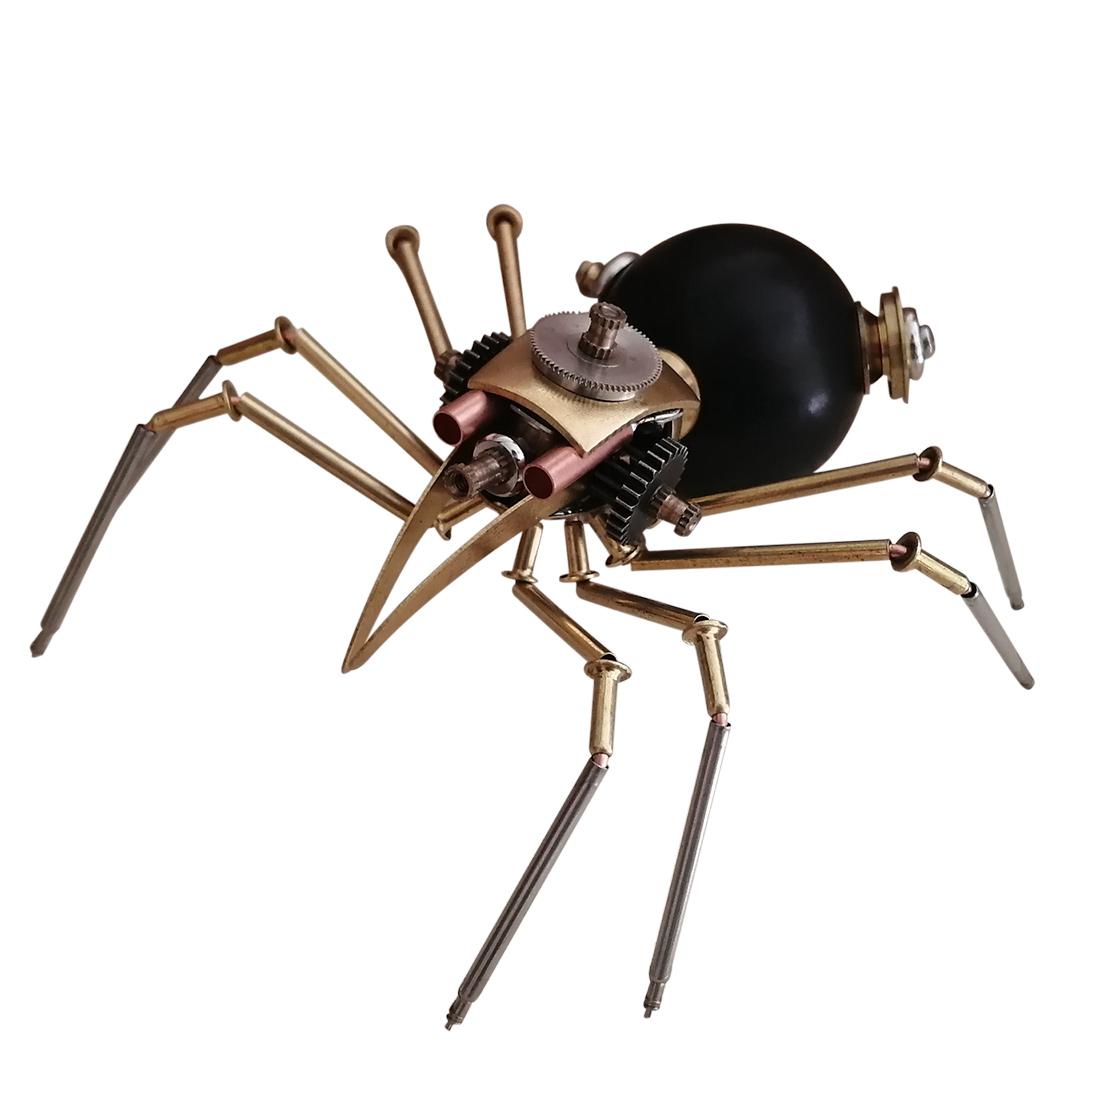 Black Spider 3D Puzzle Metal Mechanical Model Kits